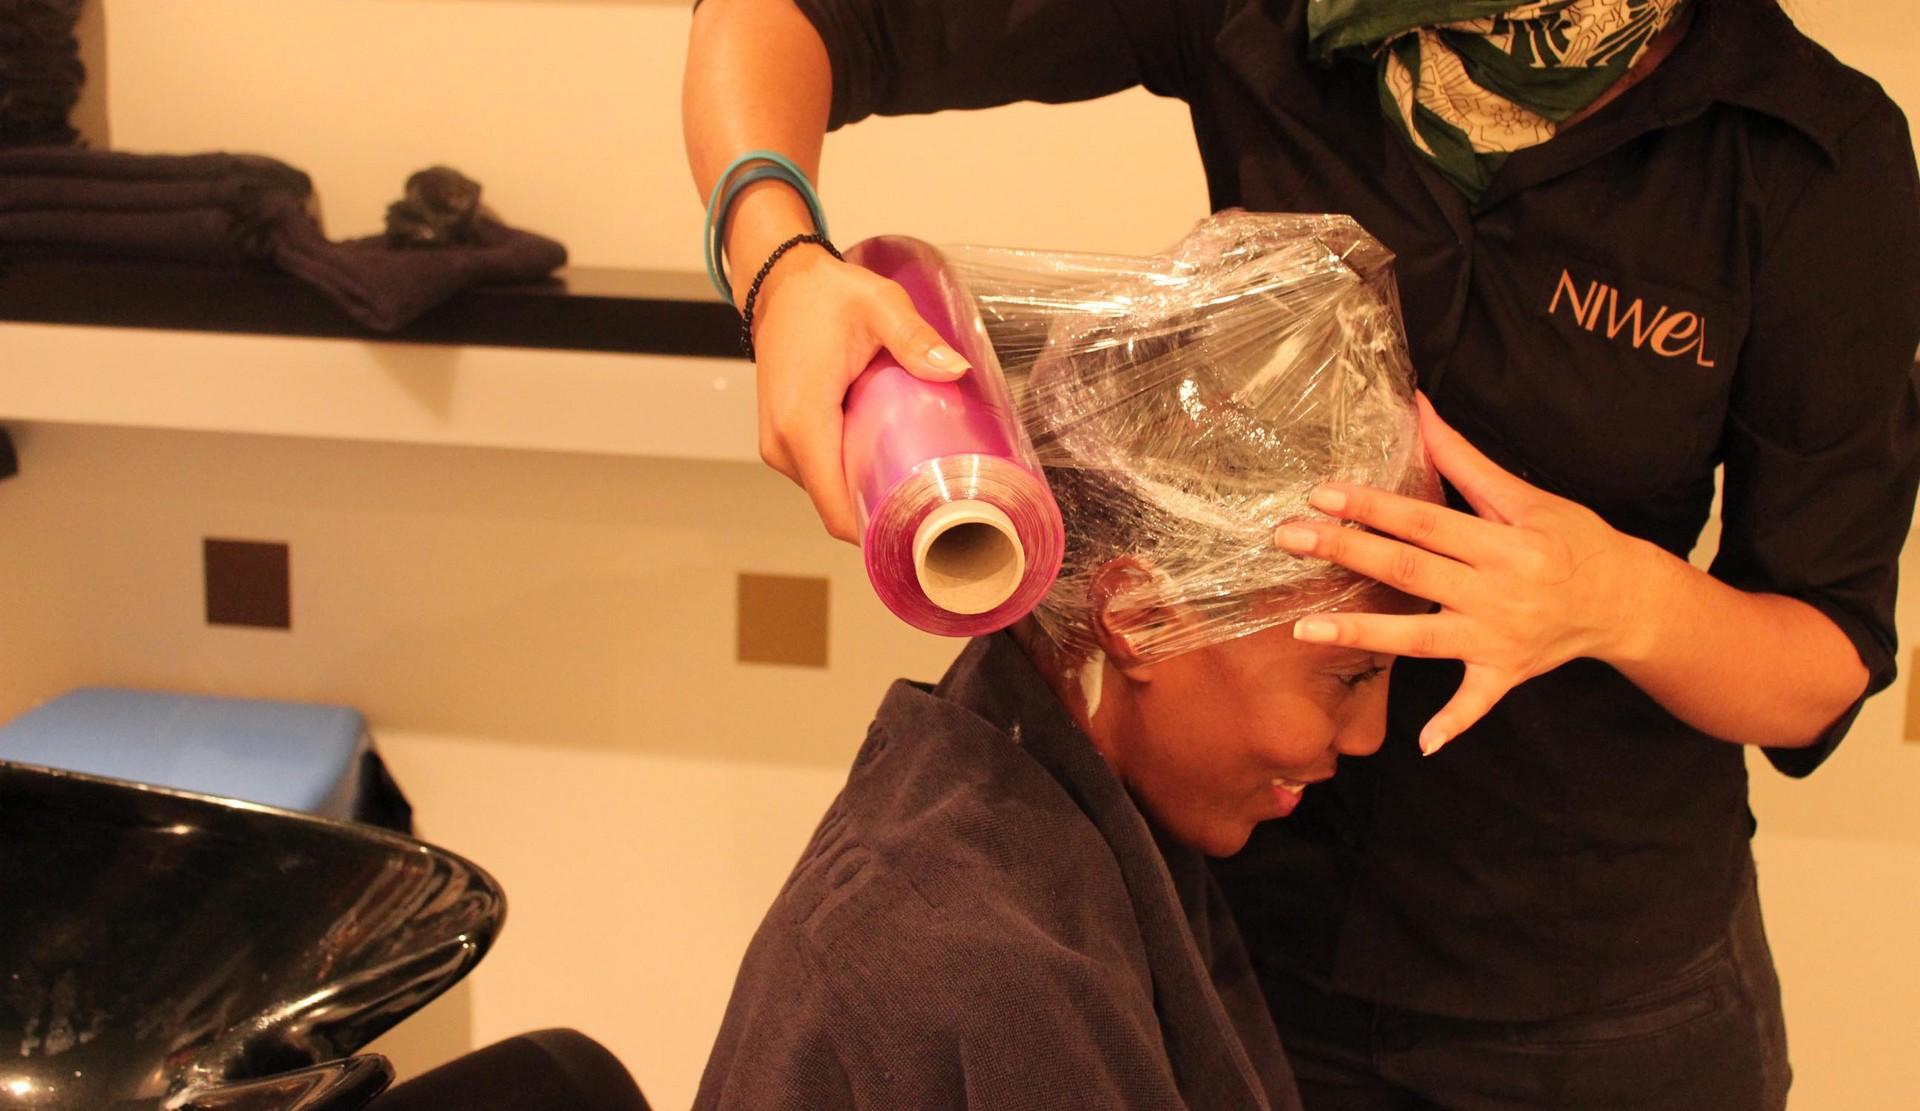 Neutralizing conditionner Nunaavane Niwel hair salon